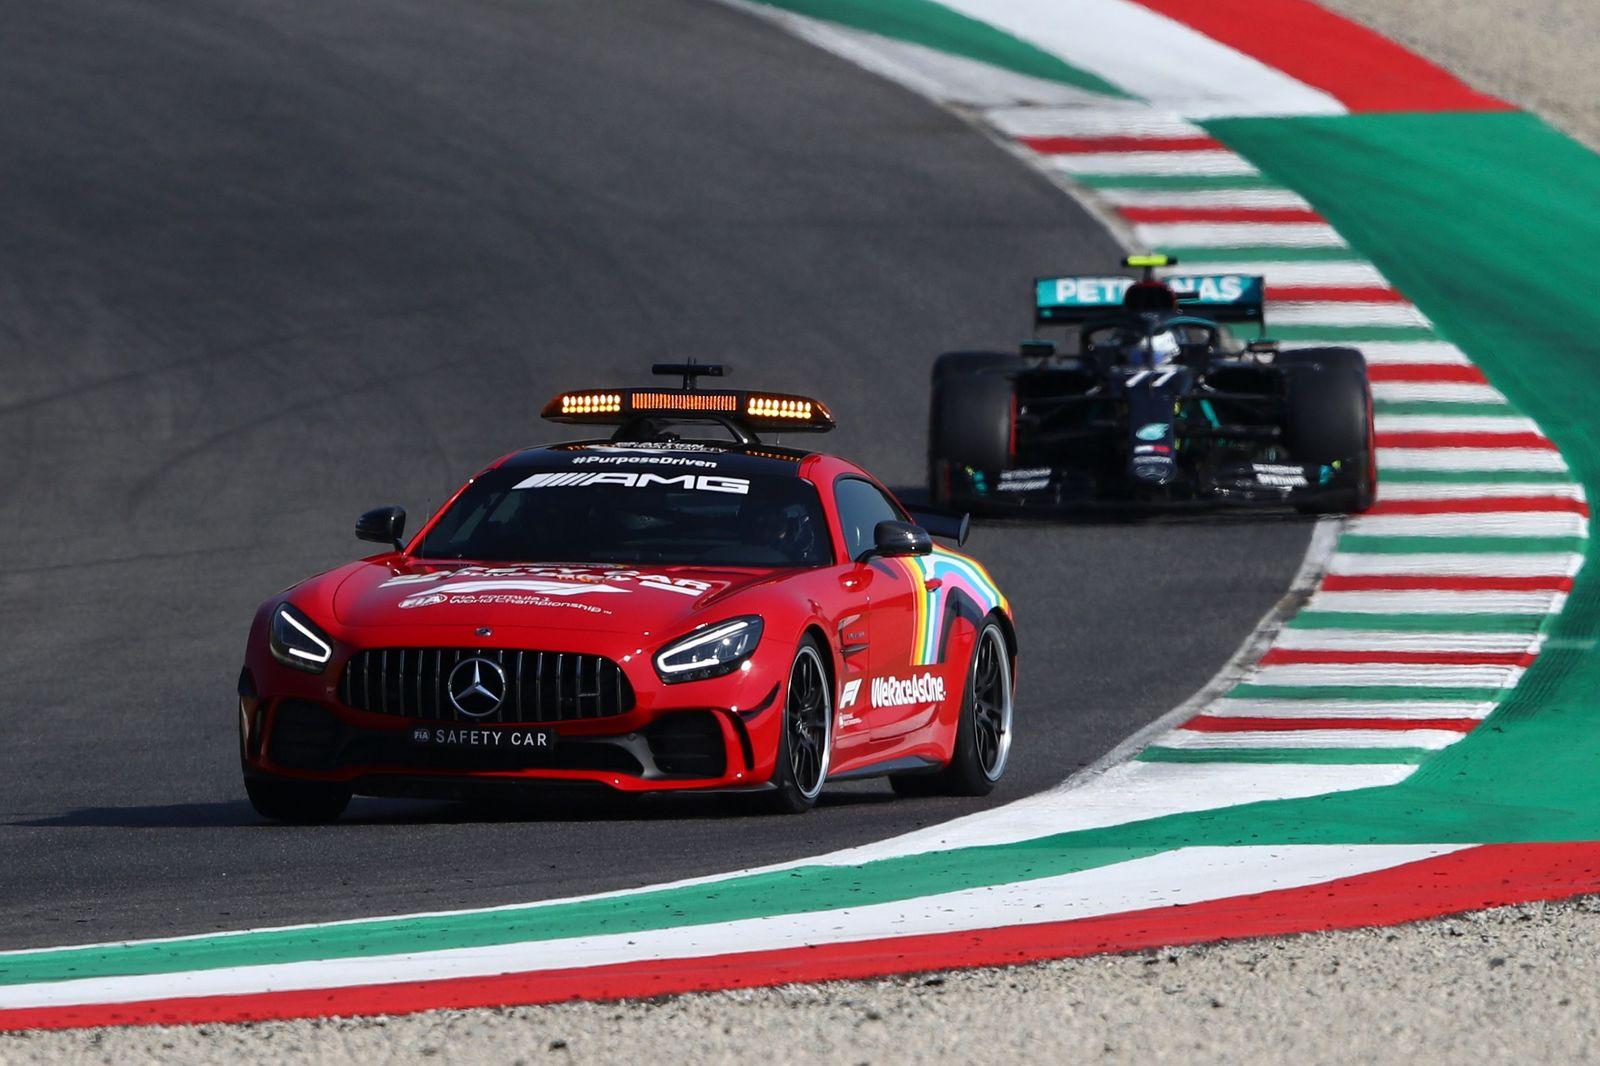 Formula One Grand Prix of Tuscany, Mugello, Italy - 13 Sep 2020